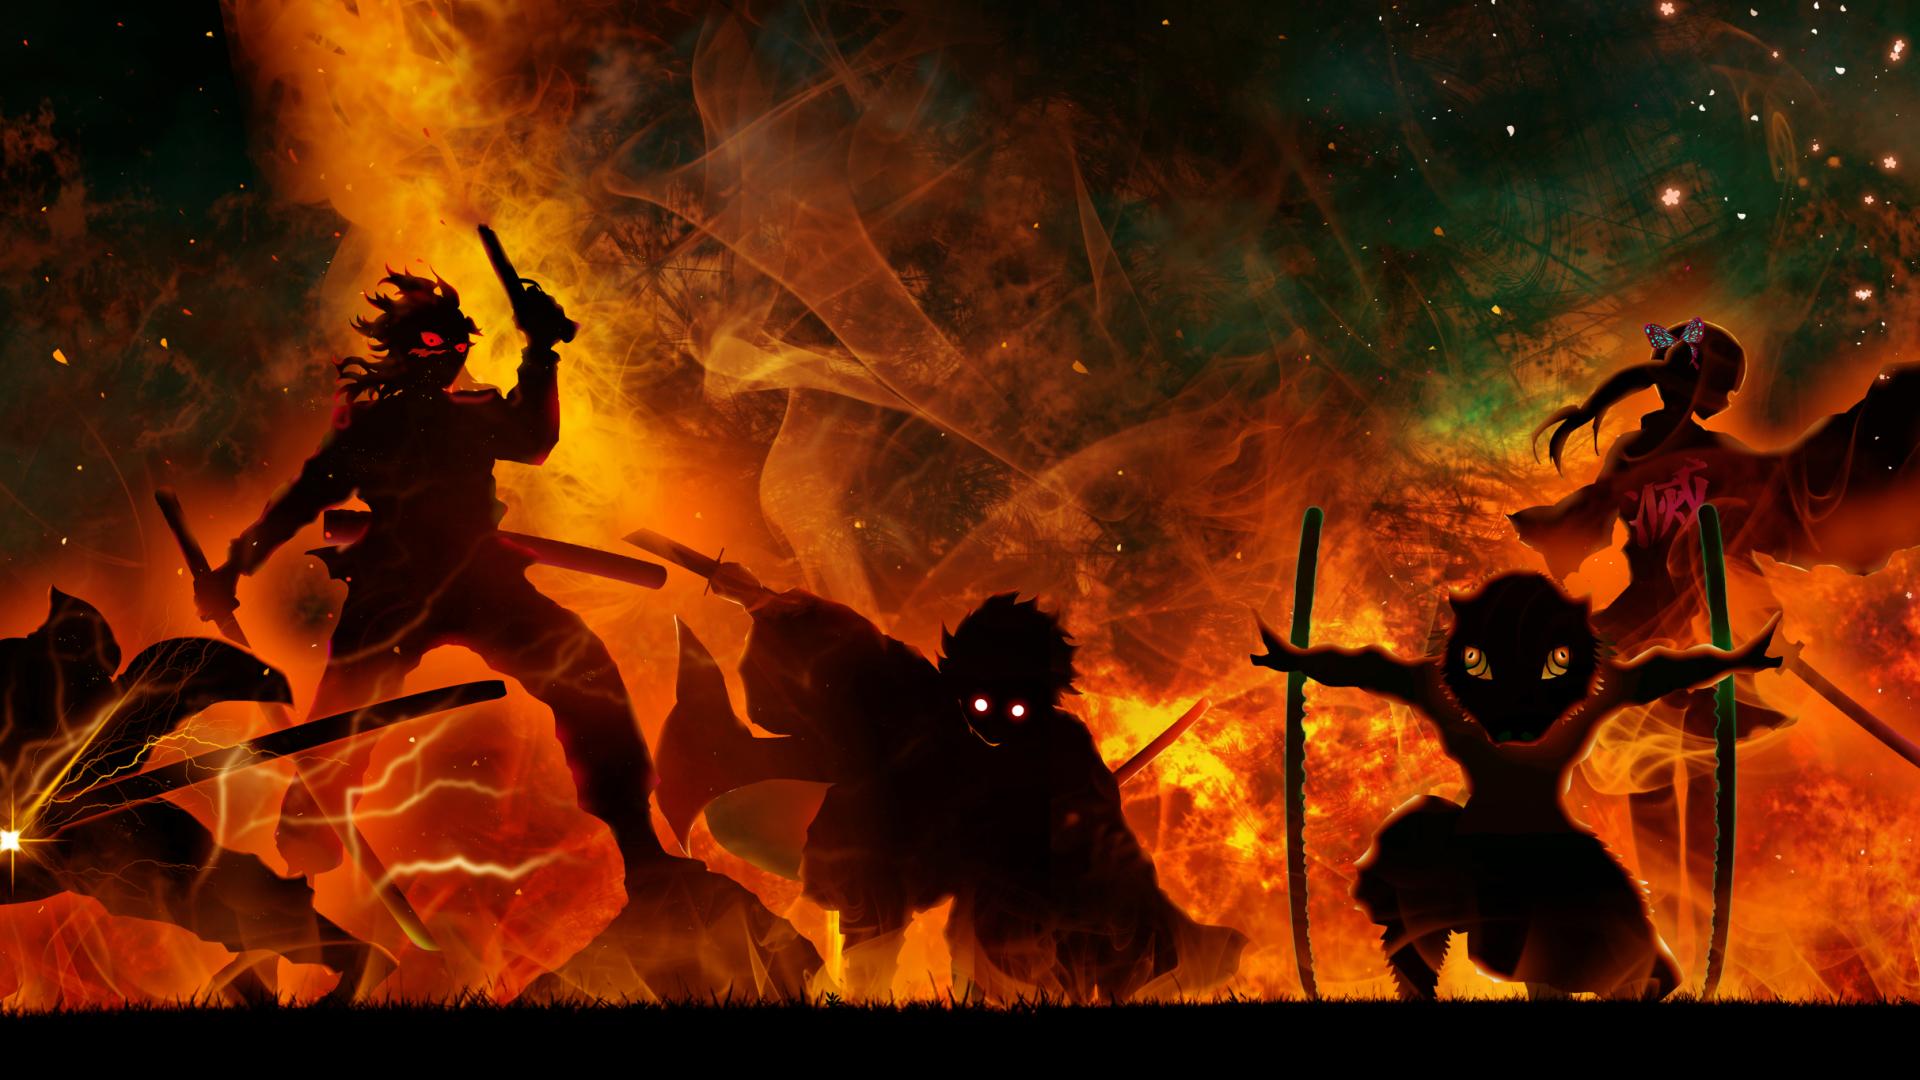 1920x1080 Demon Slayer Art 1080P Laptop Full HD Wallpaper, HD Anime 4K Wallpapers, Images ...